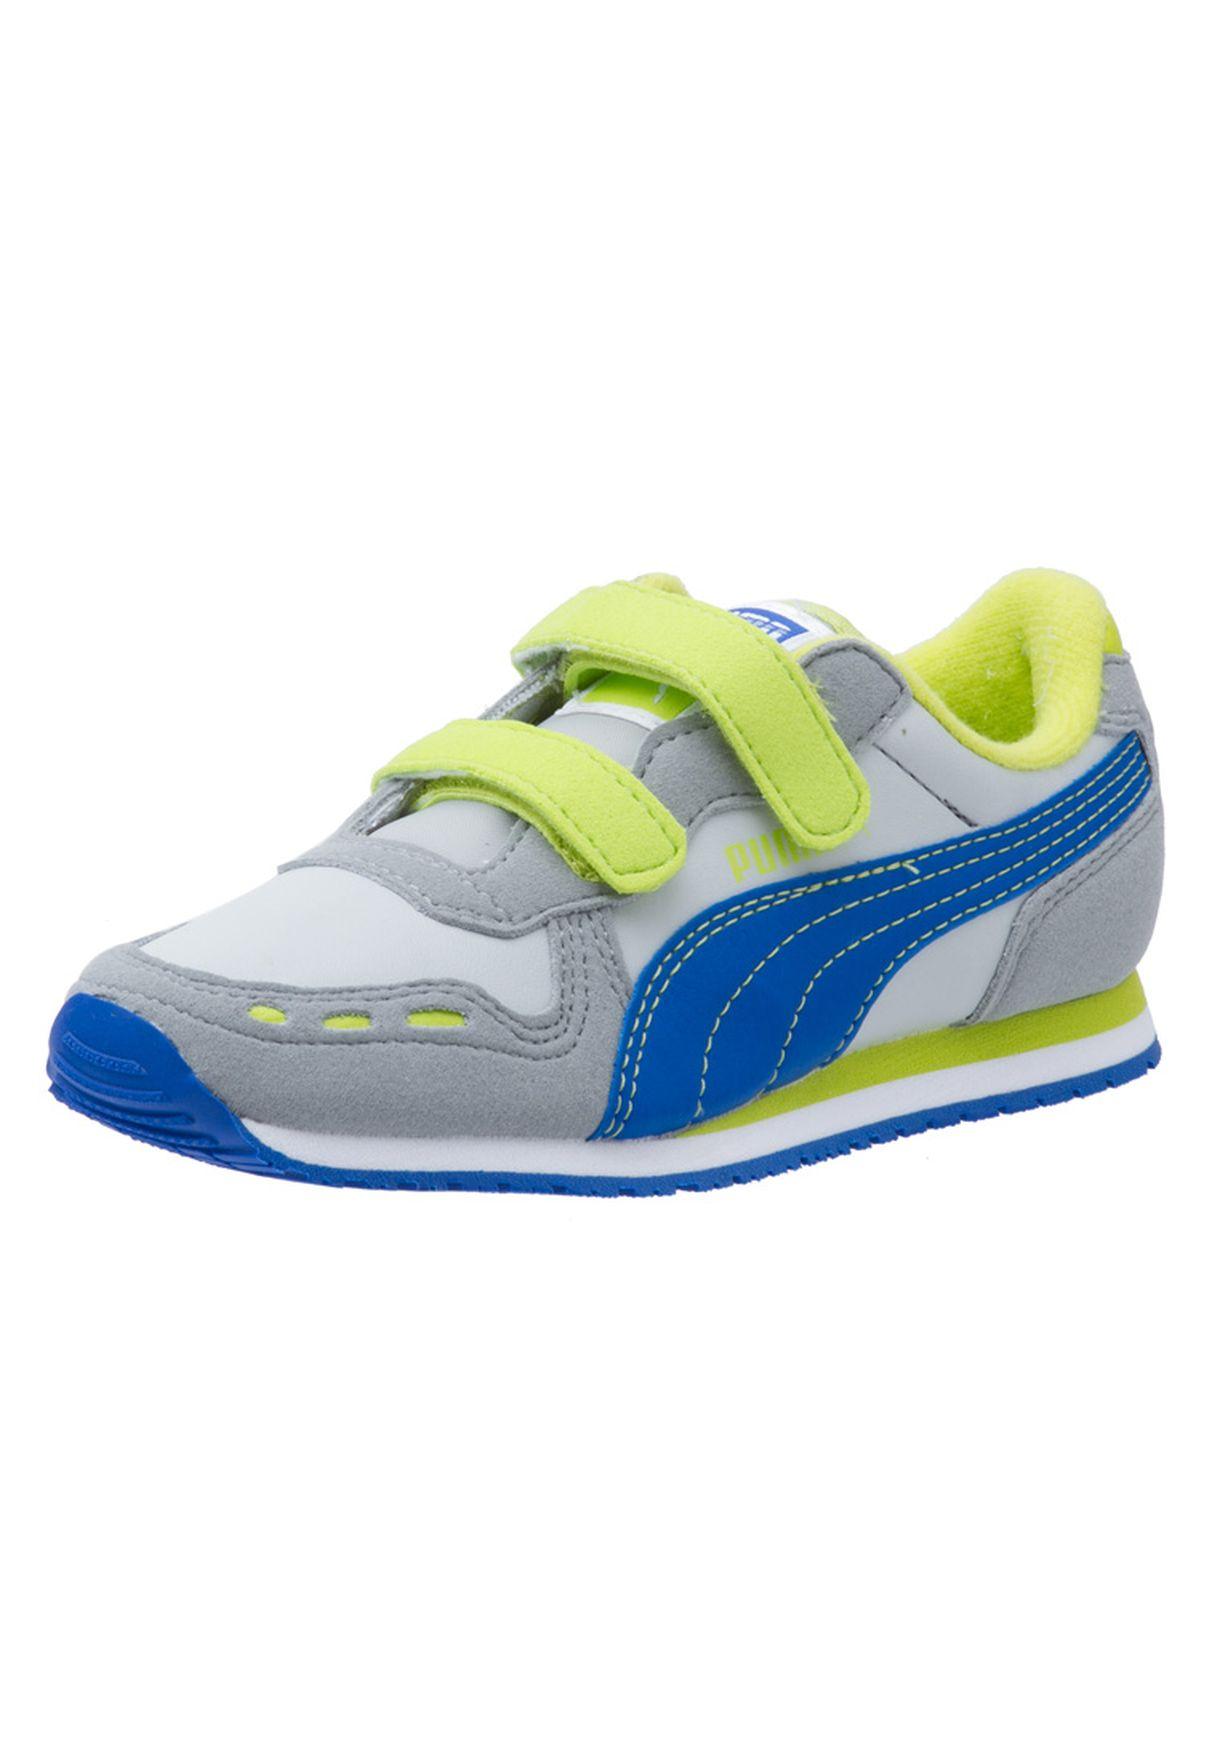 55a39ae6b4 Shop PUMA multicolor Cabana Racer Sl V 35198008 for Kids in Globally ...